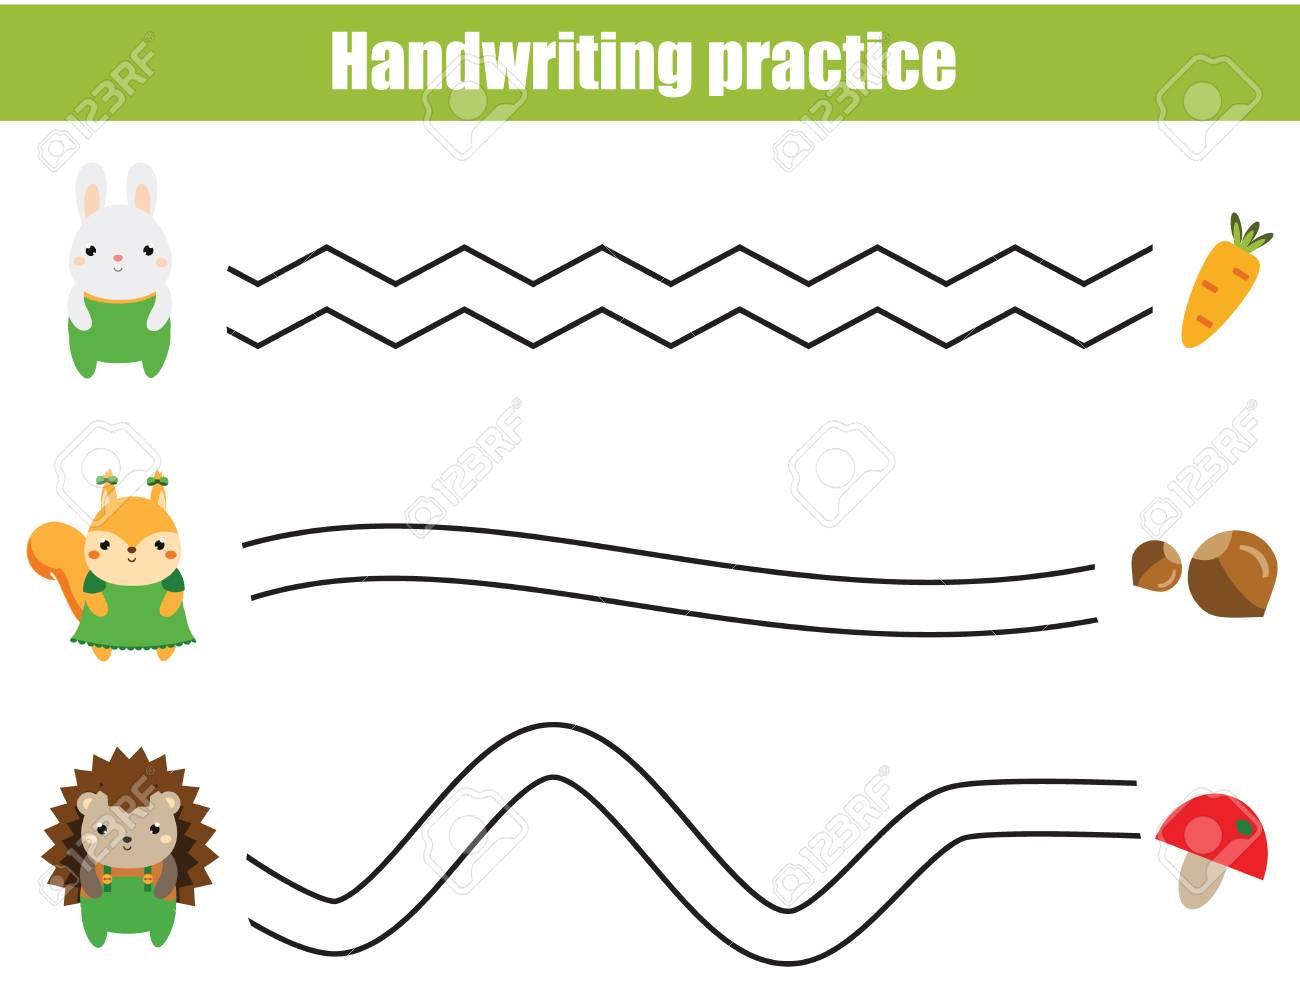 Handwriting practice sheet. Educational children game, printable worksheet for kids. Help animals find food. - 105098869